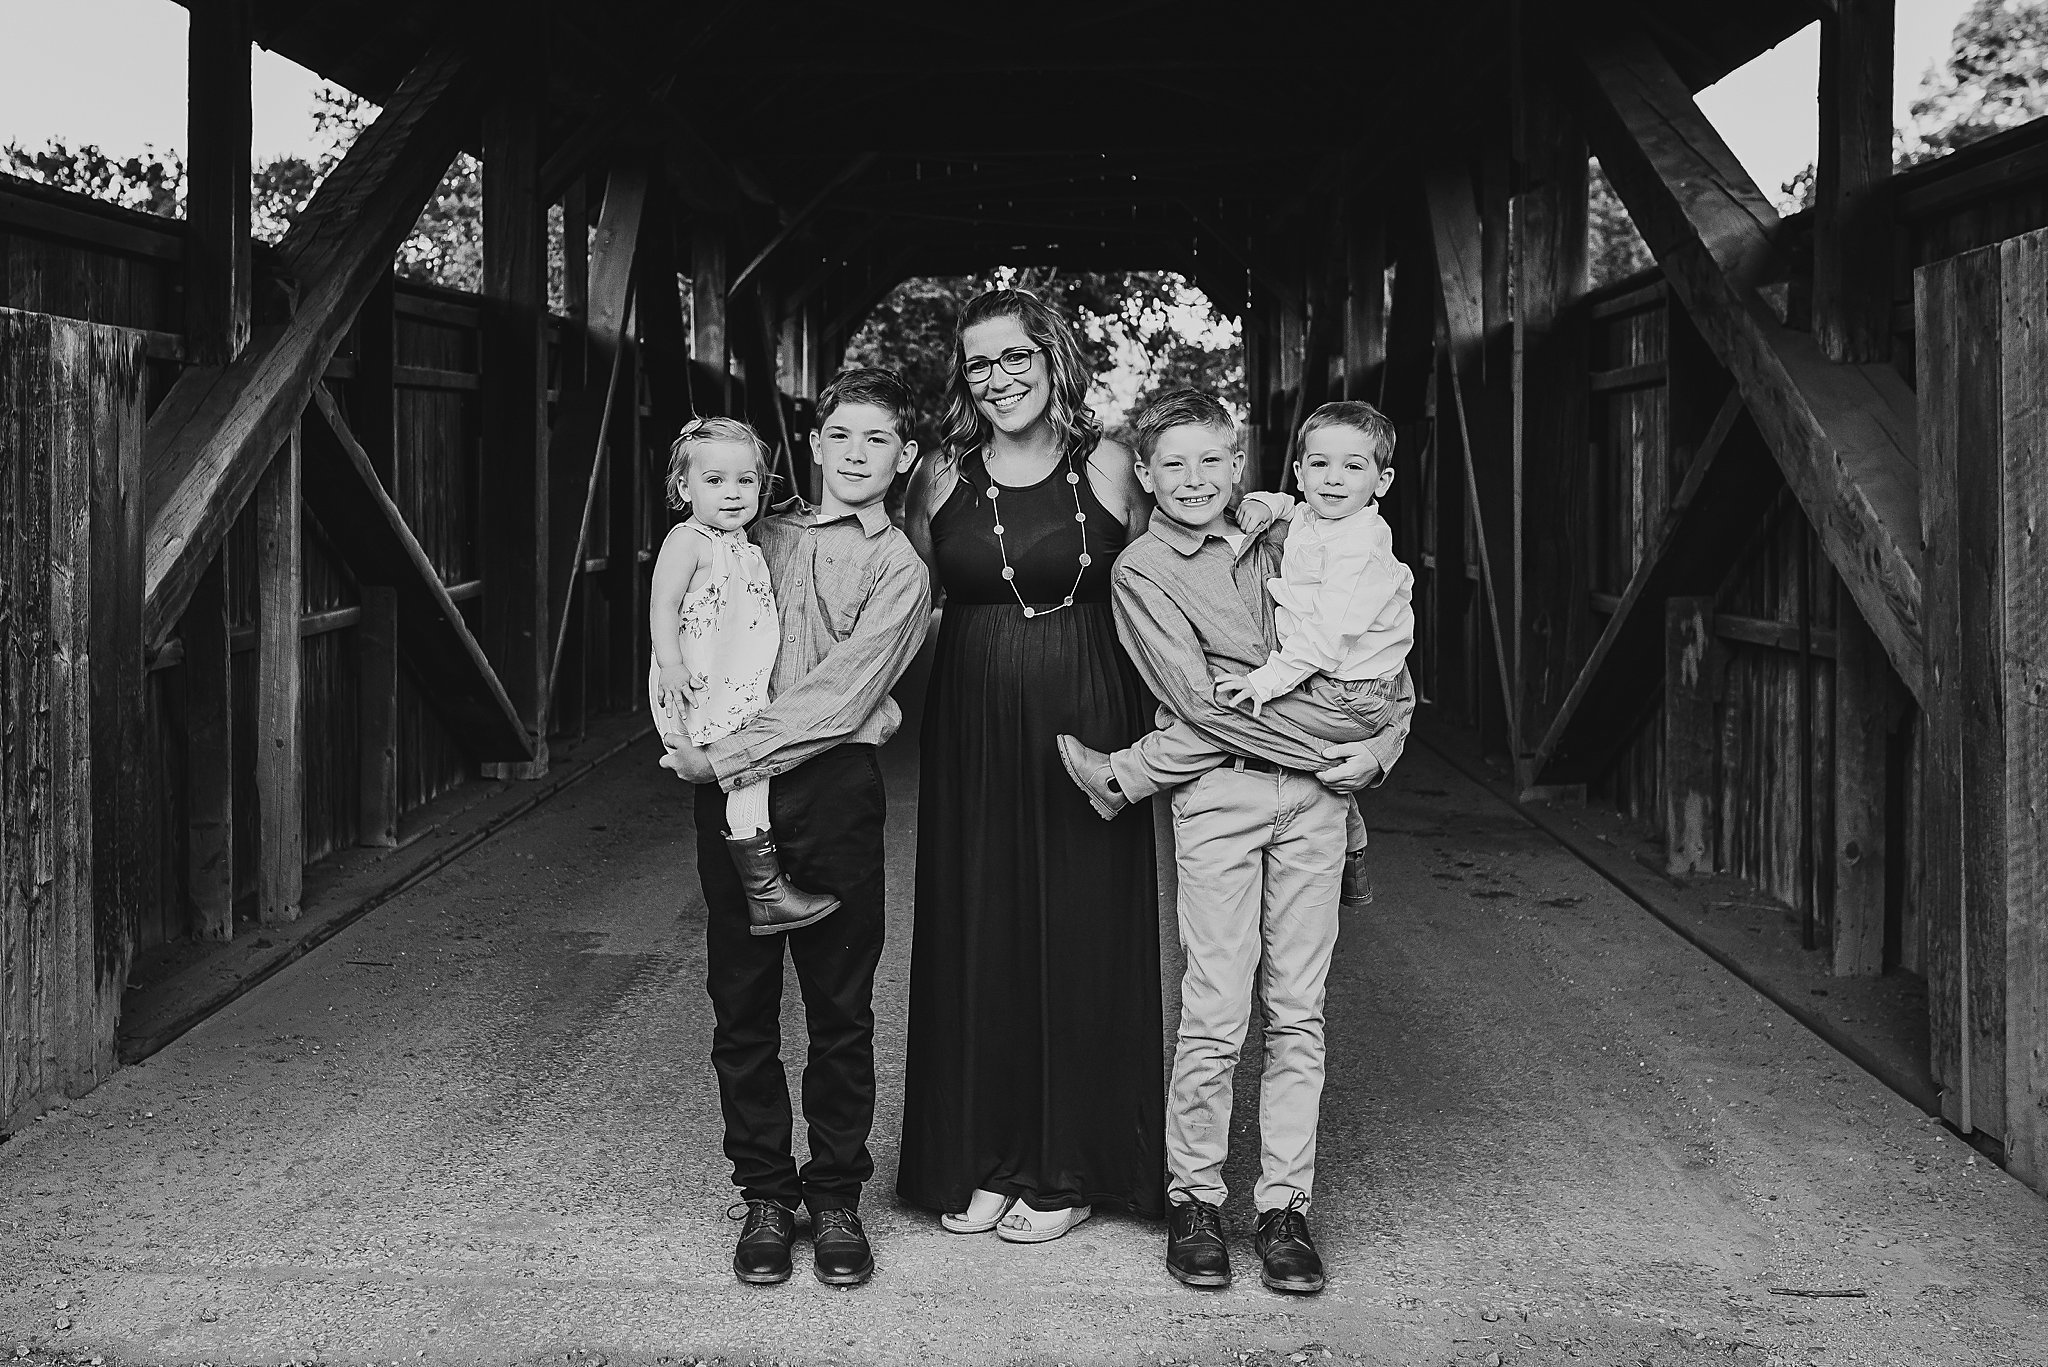 virginiabeachfamilyphotographer